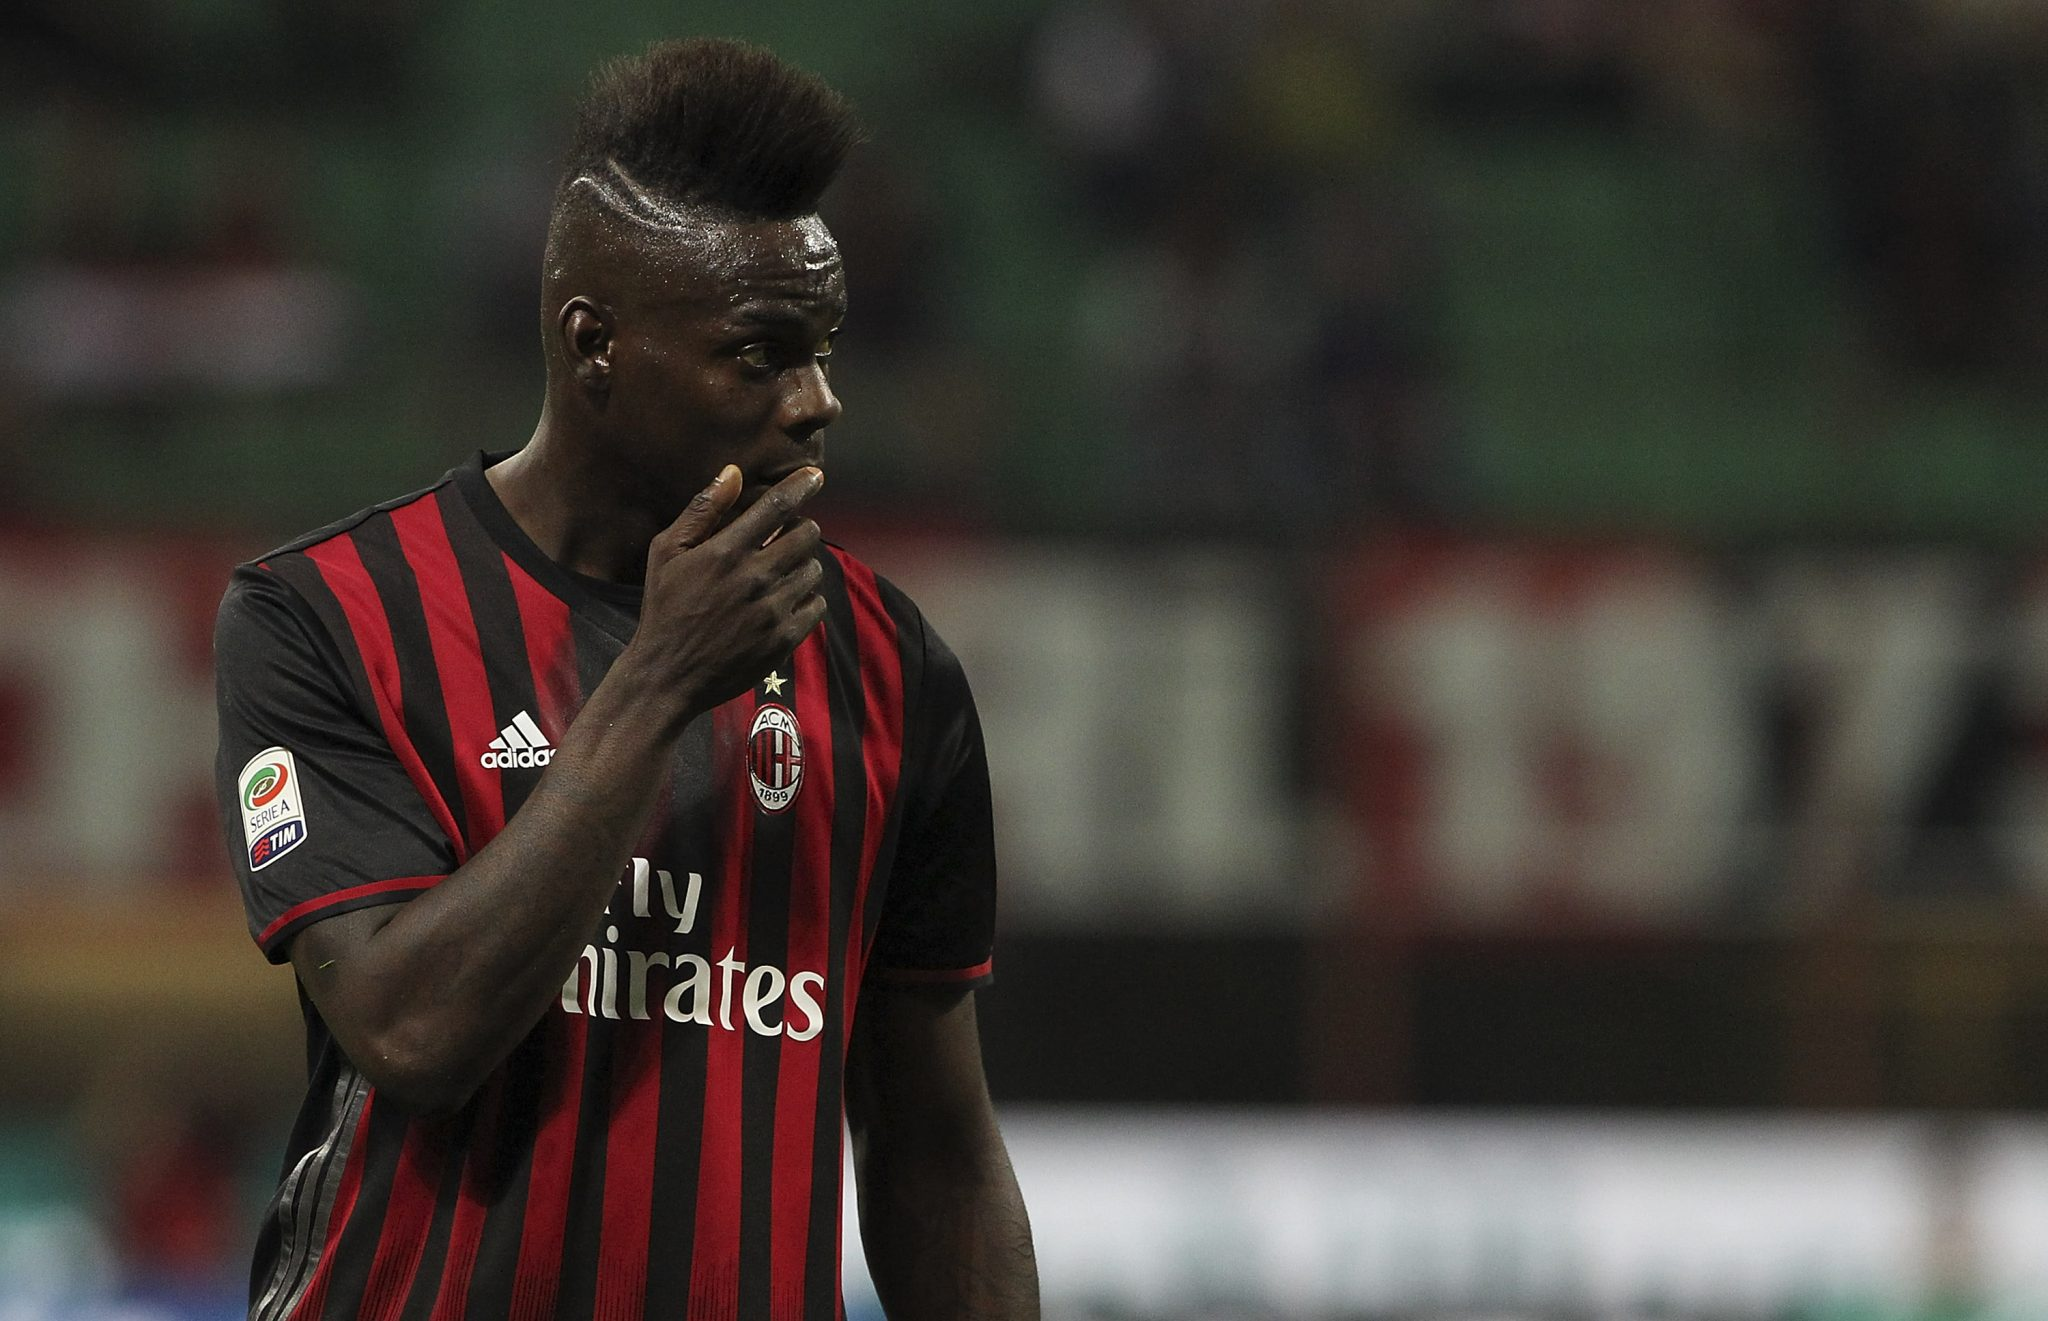 Assim como Shevchenko, Balotelli marcou poucos gols em seu retorno ao Milan (Getty)